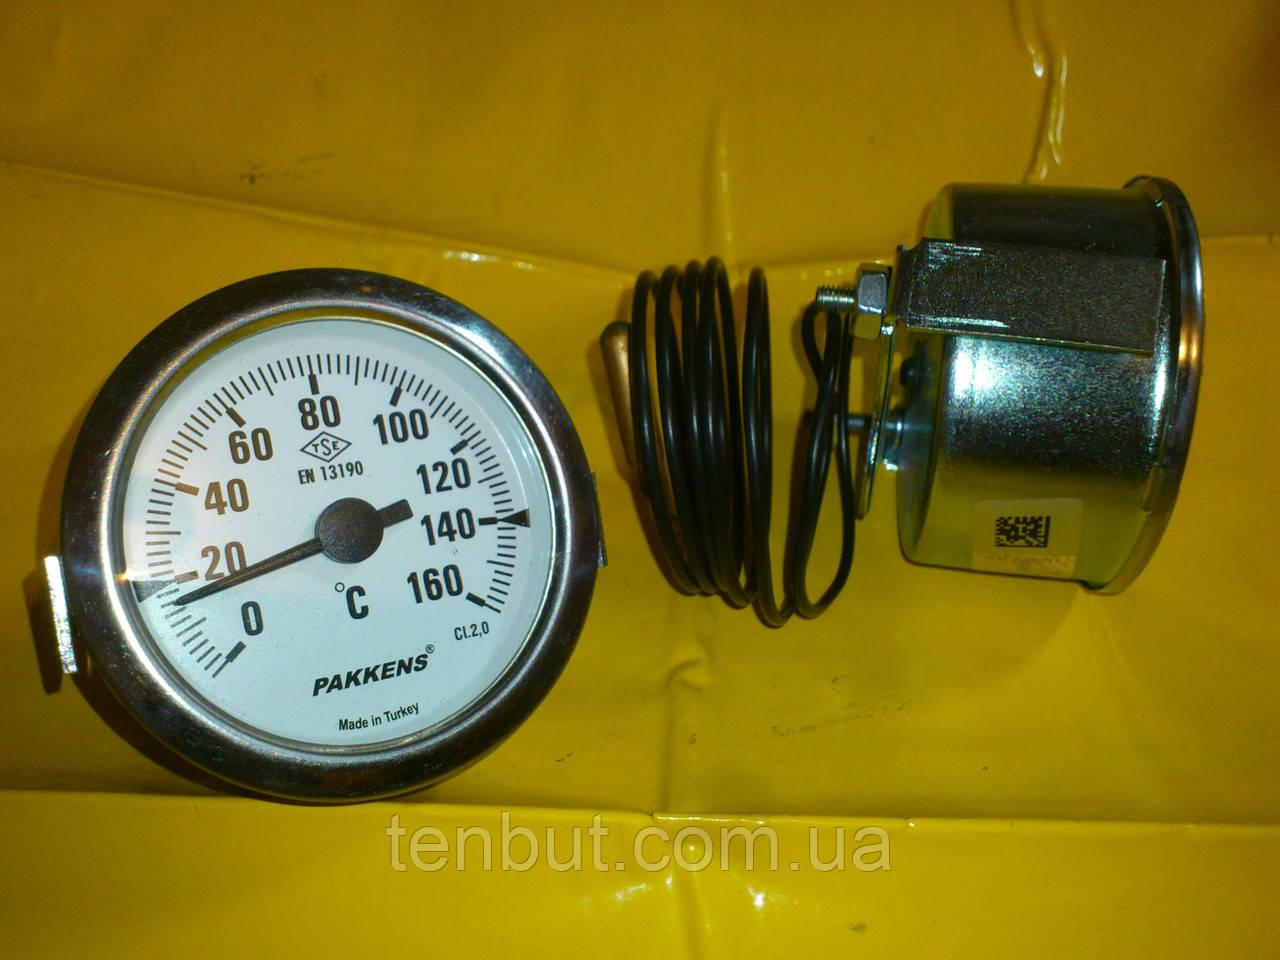 Термометр металлический 160 ℃ / Ø-60 мм. с капилляром 1-метр. PAKKENS производство Турция